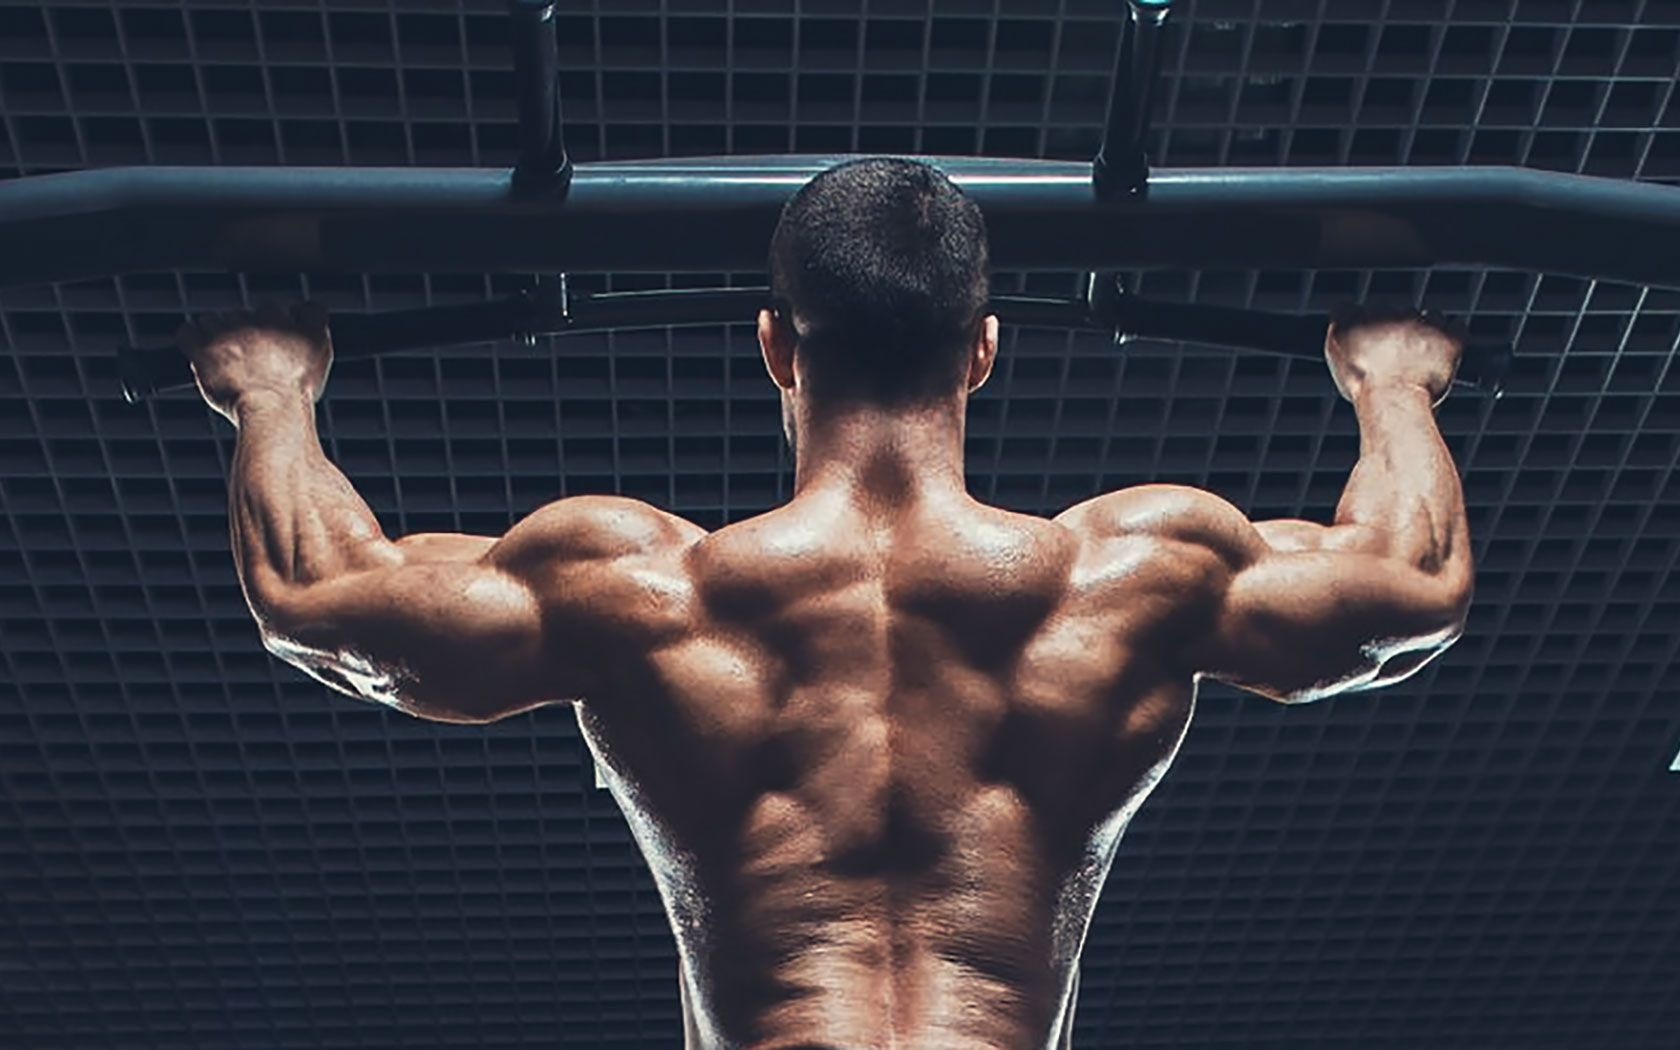 motivational workout wallpapers